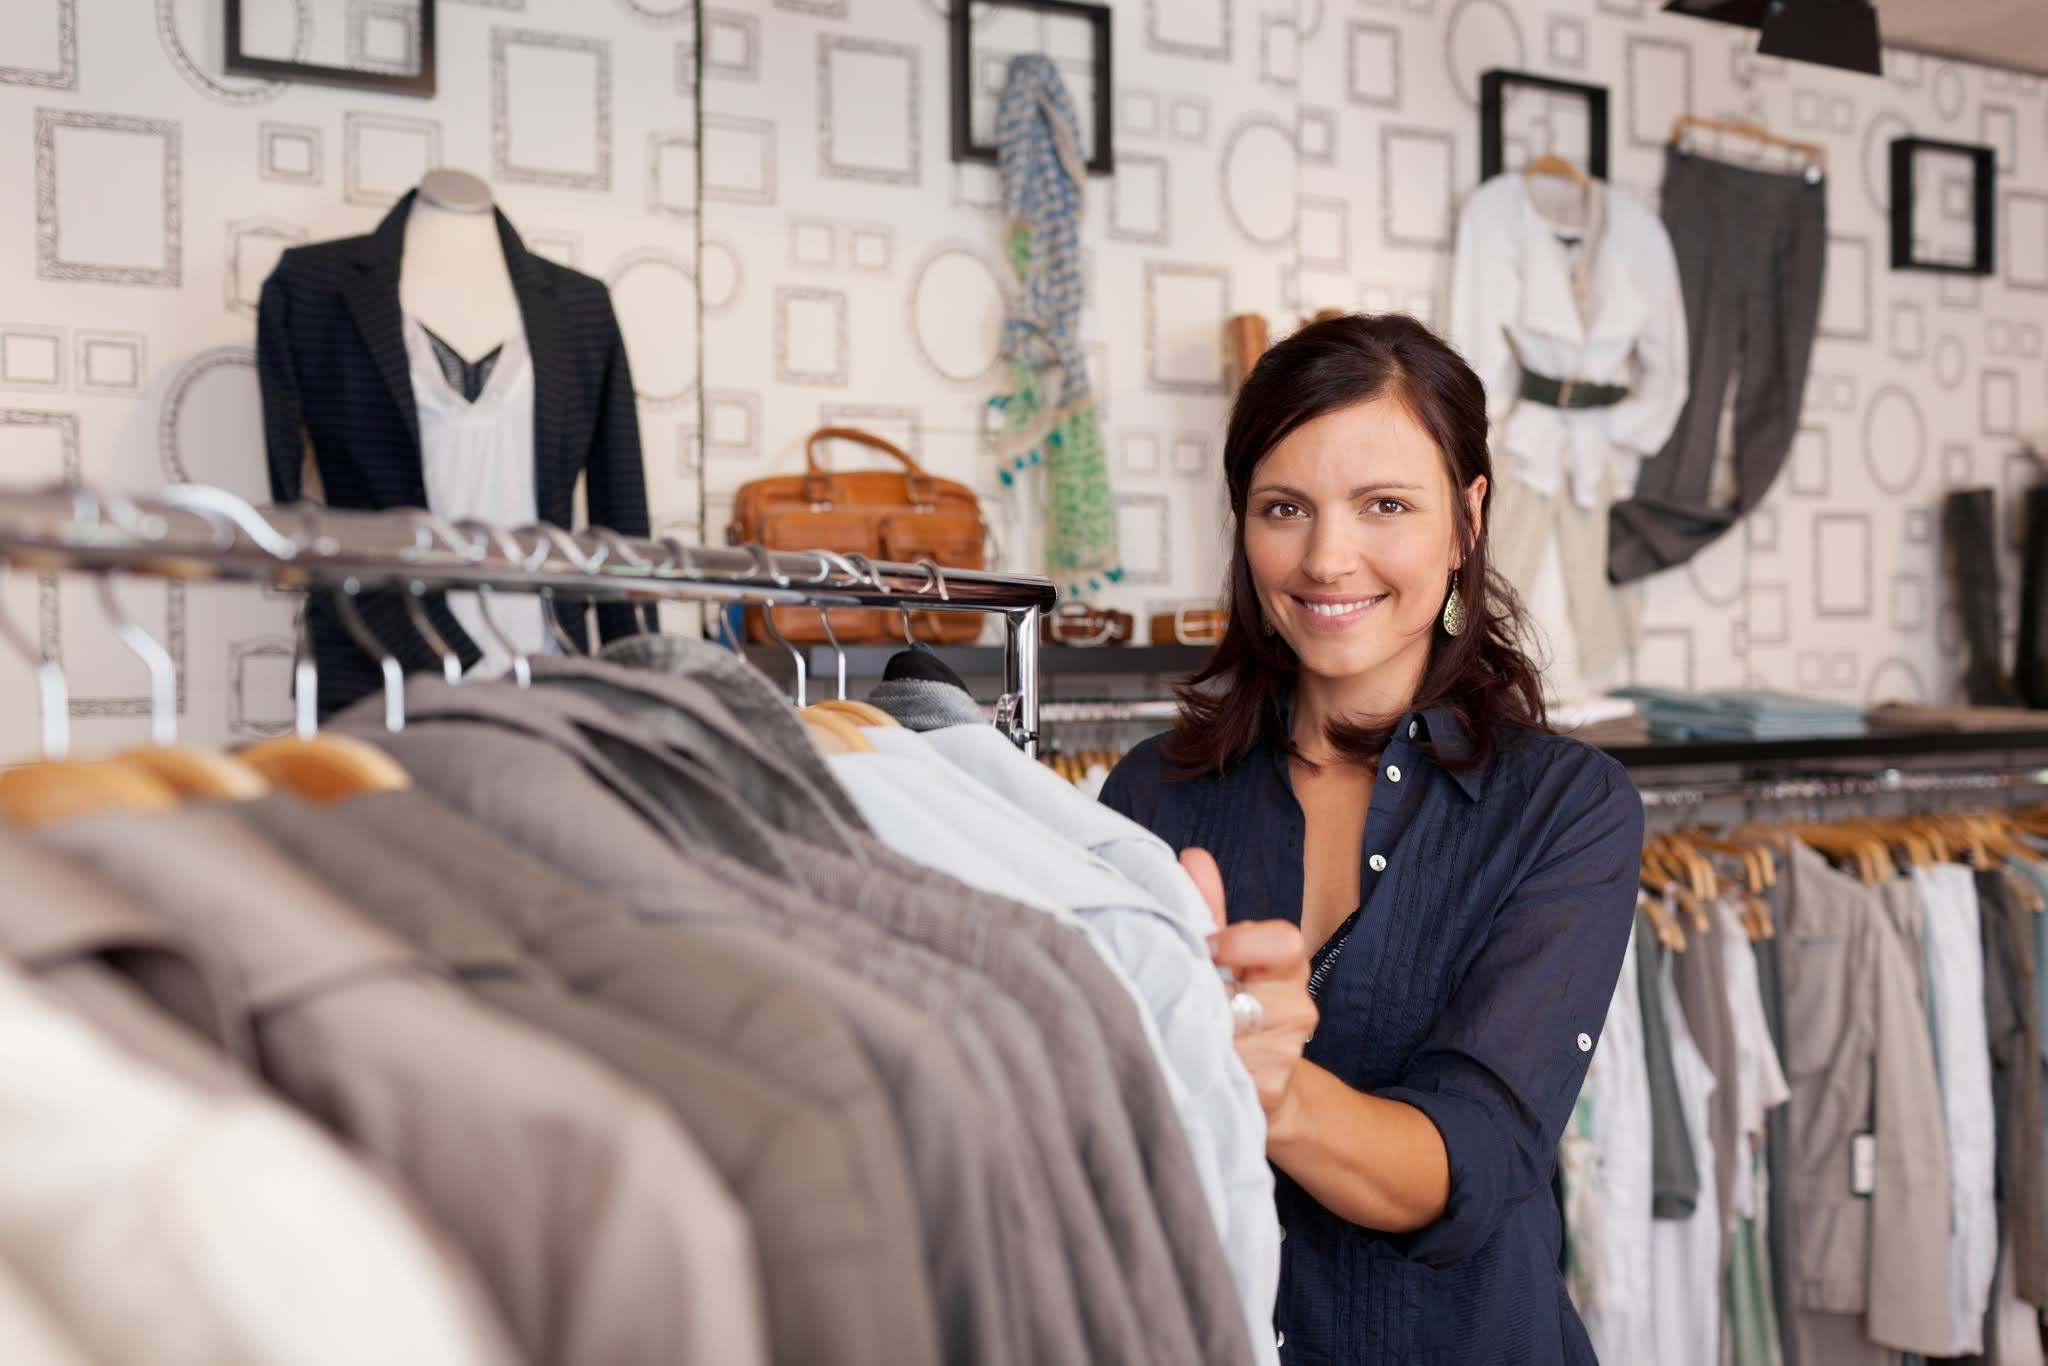 clothing business captions, cloth captions, business captions and slogan, Instagram captions for clothing